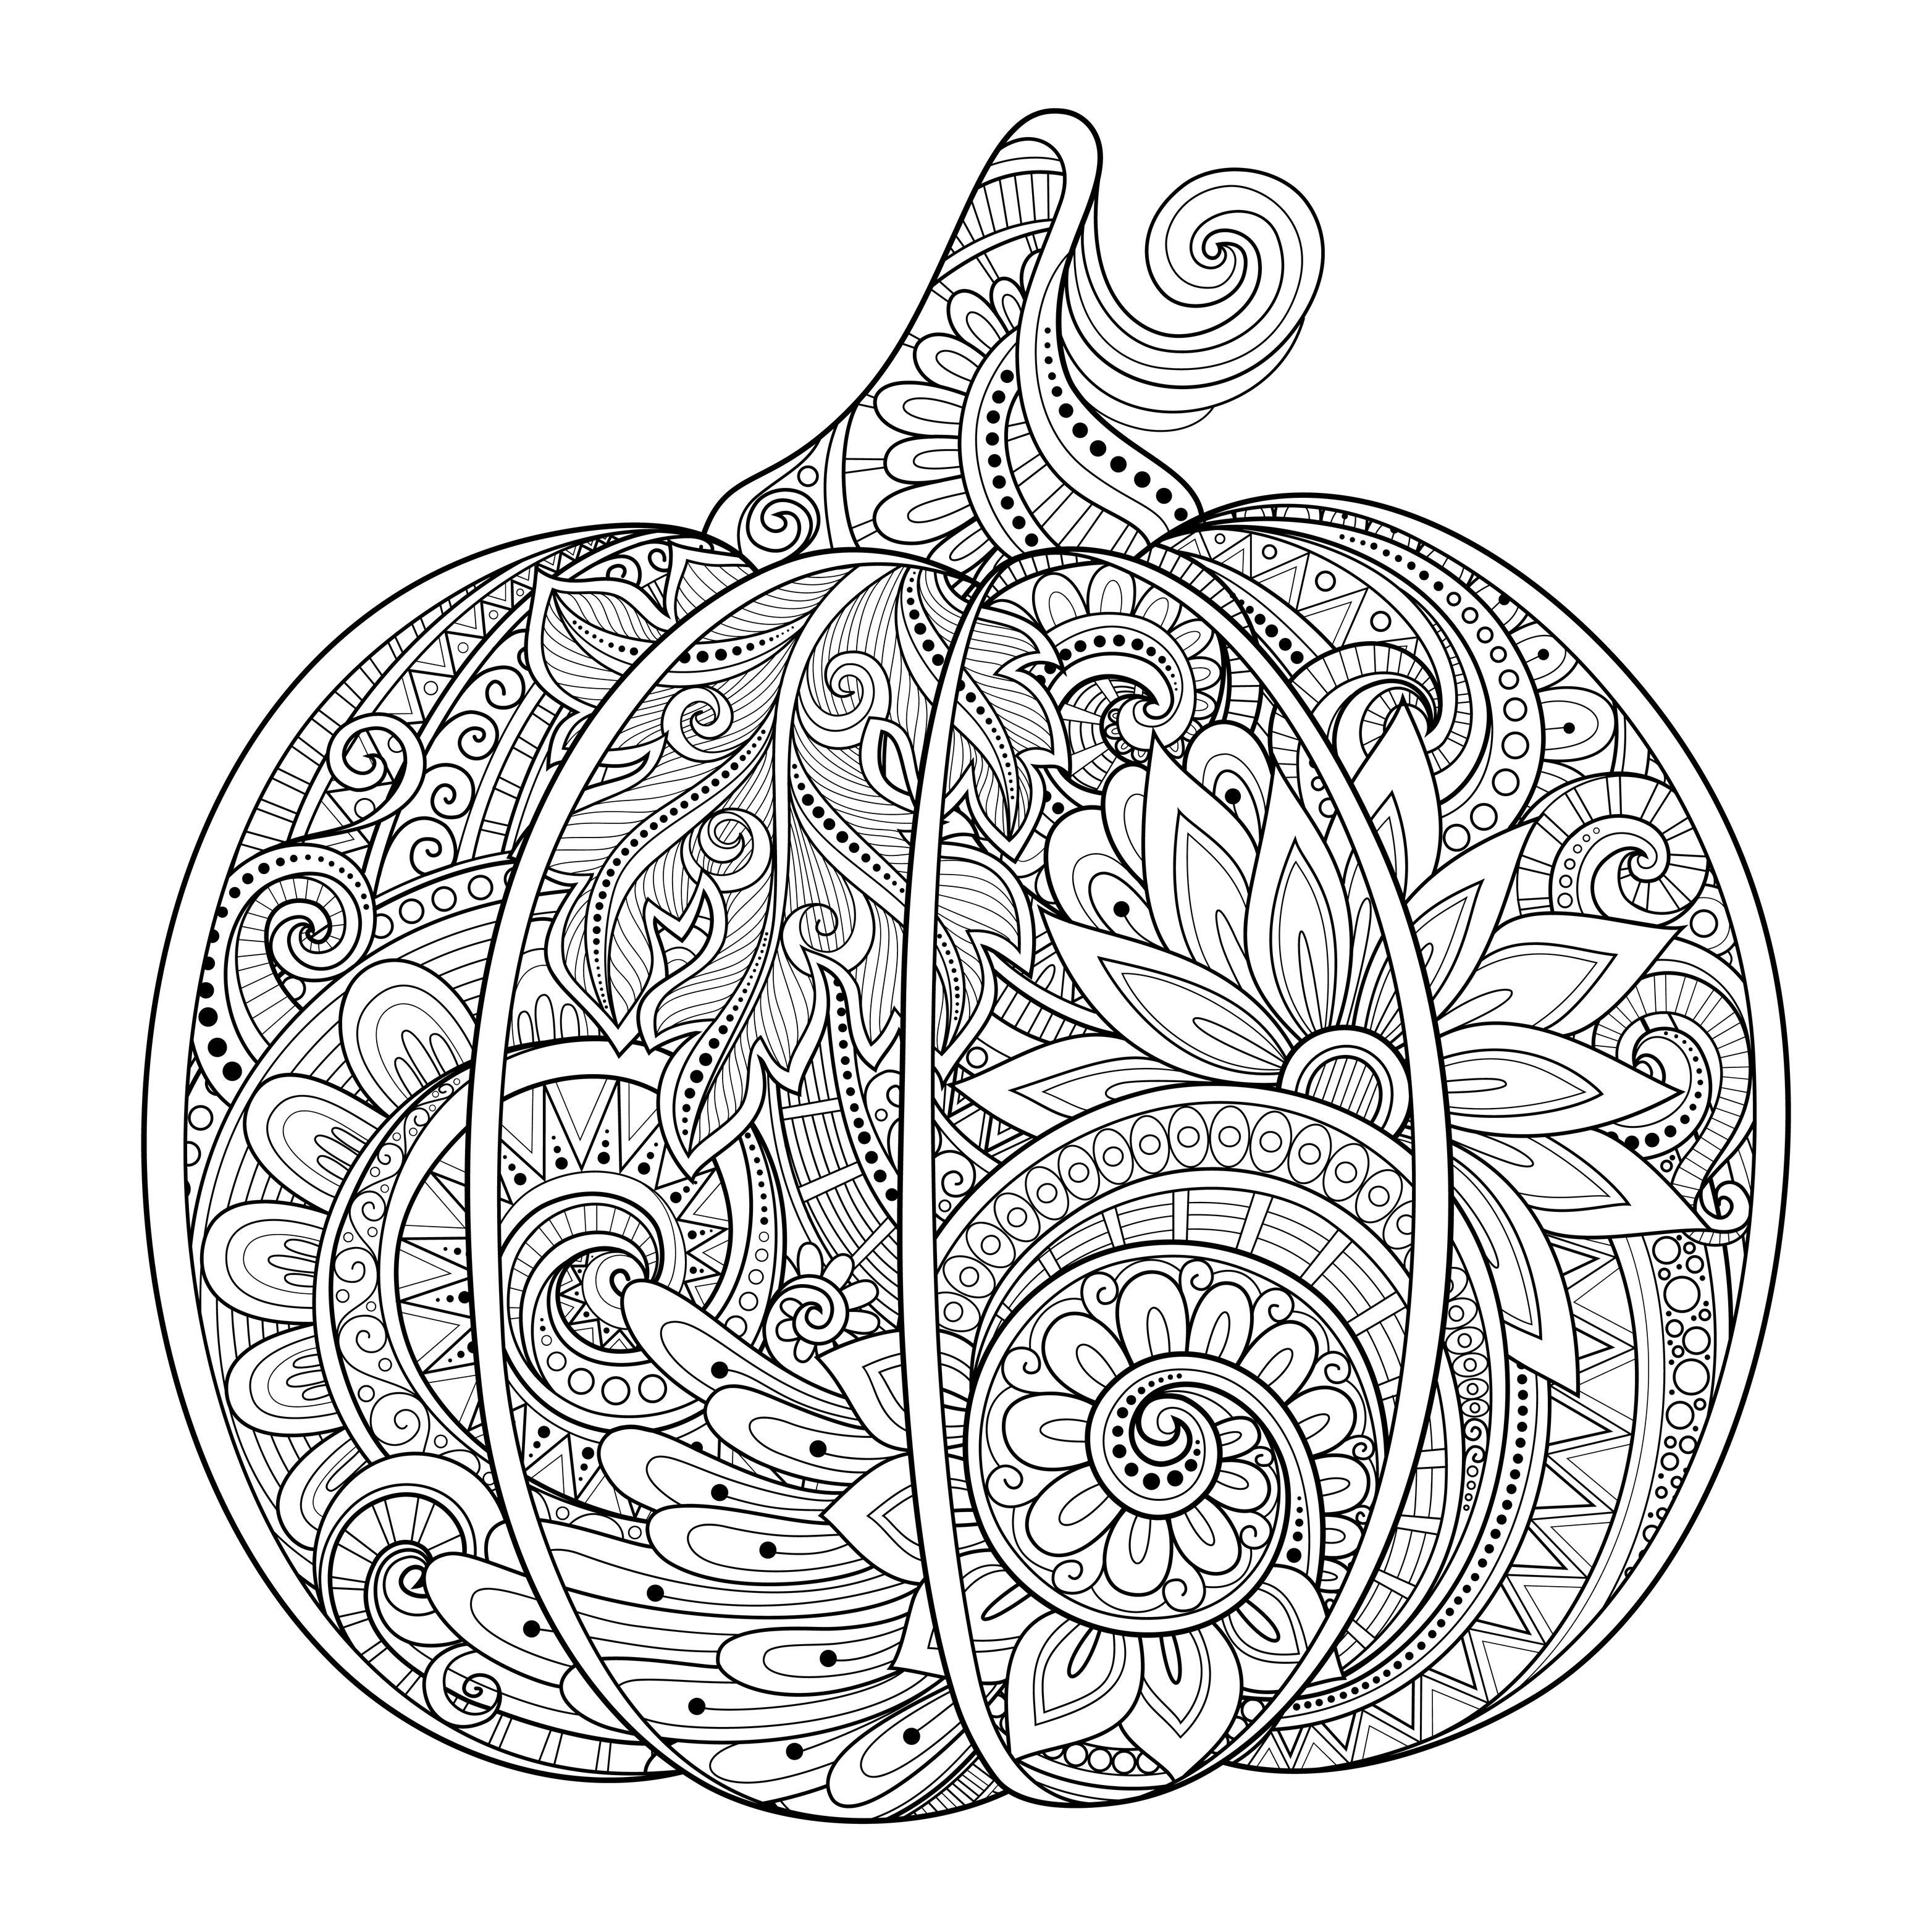 Citrouille halloween zentangle source 123rf - Citrouille a colorier halloween ...